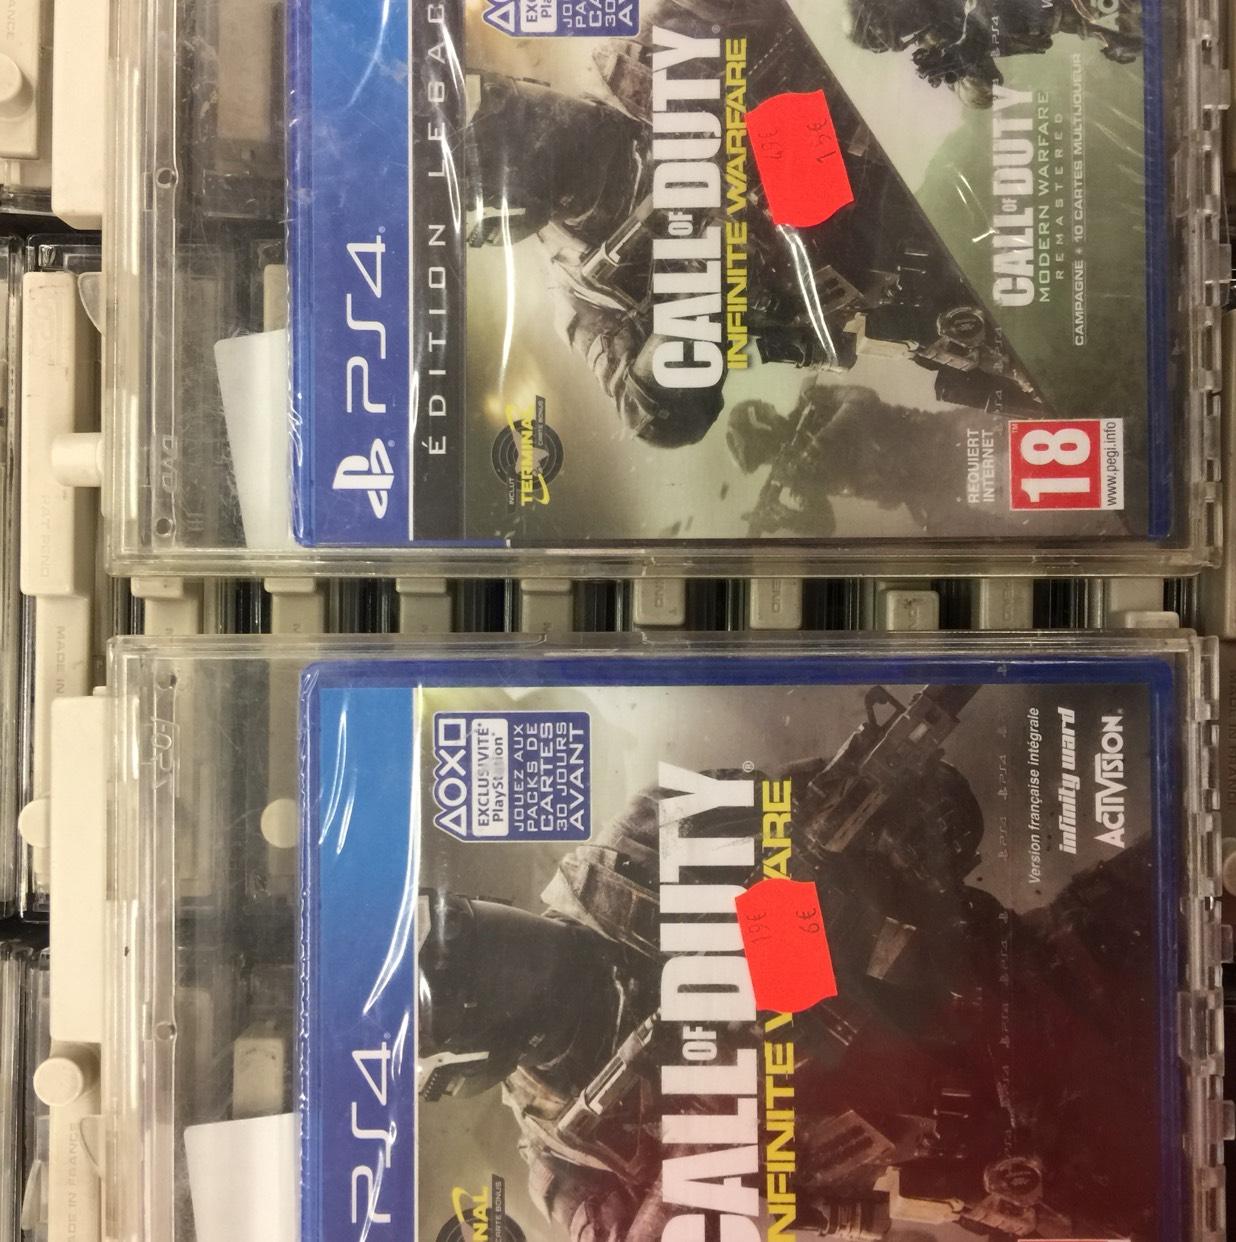 Jeu Call of Duty Infinity Warfare sur PS4 - Noisy Le Grand Les Arcades (93)